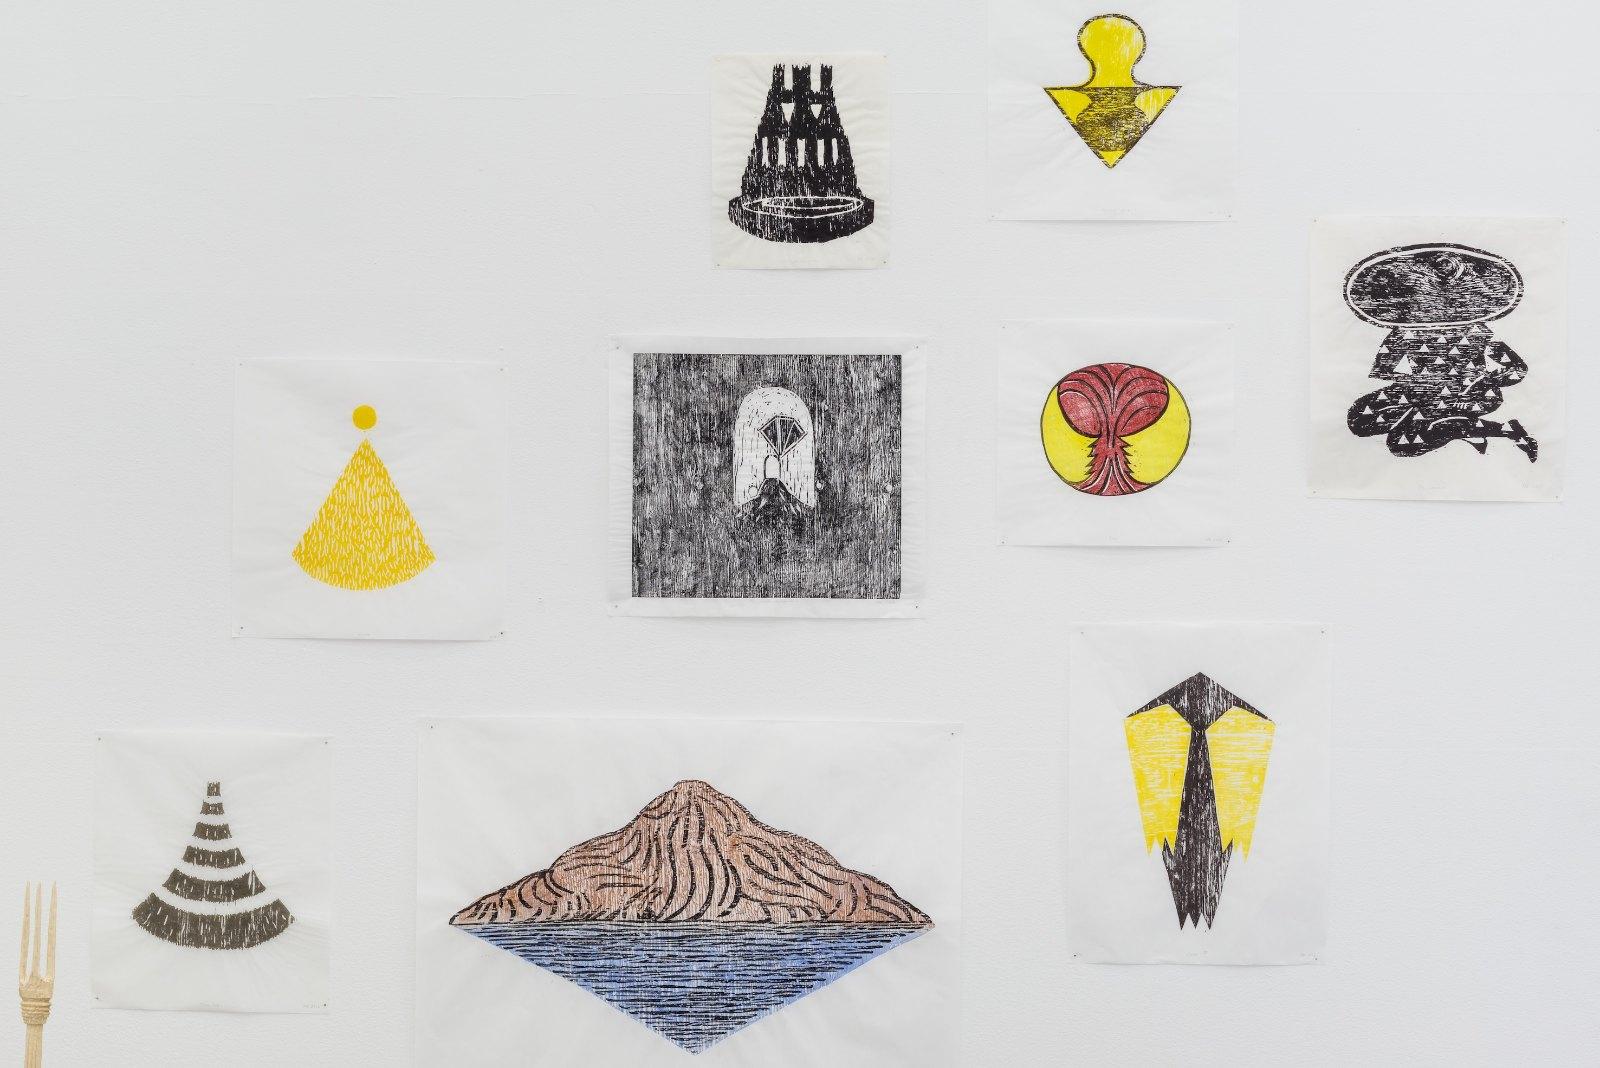 Magnus Dahl, Transition, 2012, woodcut, 46 x 39 cm, ed. 1 / Mount Analogue, 2012, woodcut, 63 x 95 cm, ed. 1 / Agape III, 2012, woodcut, 55 x 42 cm, ed. 4 / Solen, 2011, woodcut, 56 x 45, ed. 8 / The other entrance, 2012, woodcut, 46 x 52 cm, ed. 1 / Robe, 2012, woodcut, 37 x 40 cm, ed. 3 / The Shaman, 2012, woodcut, 47 x 41 cm, ed. 1 / Castle in sky, 2012, woodcut, 35 x 29 cm, ed. 1 / Floating point, 2012, woodcut, 41 x 41 cm, ed. 2